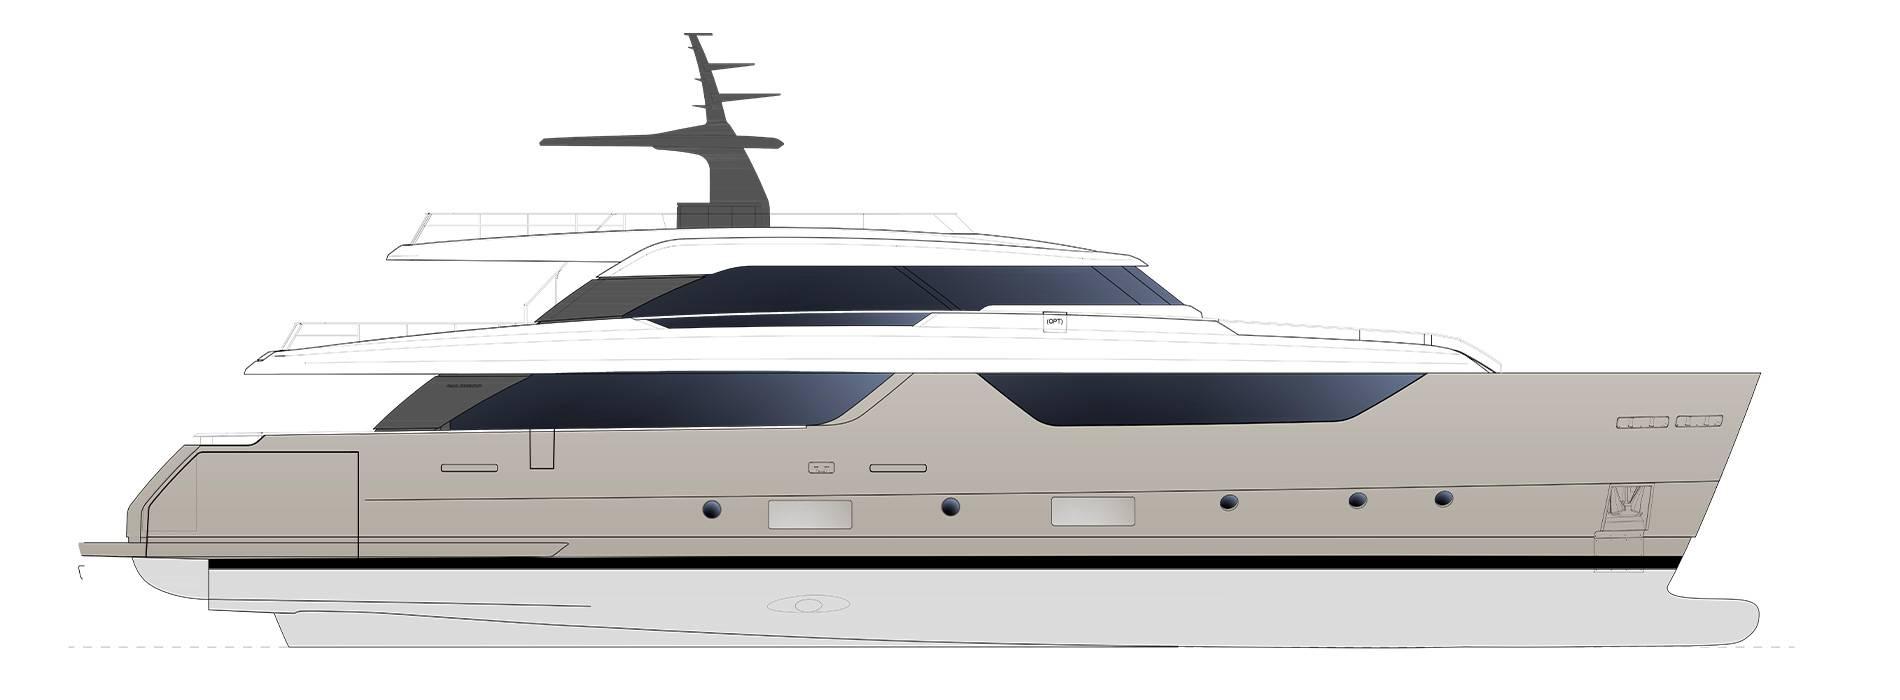 Sanlorenzo Yachts SD118 Профиль